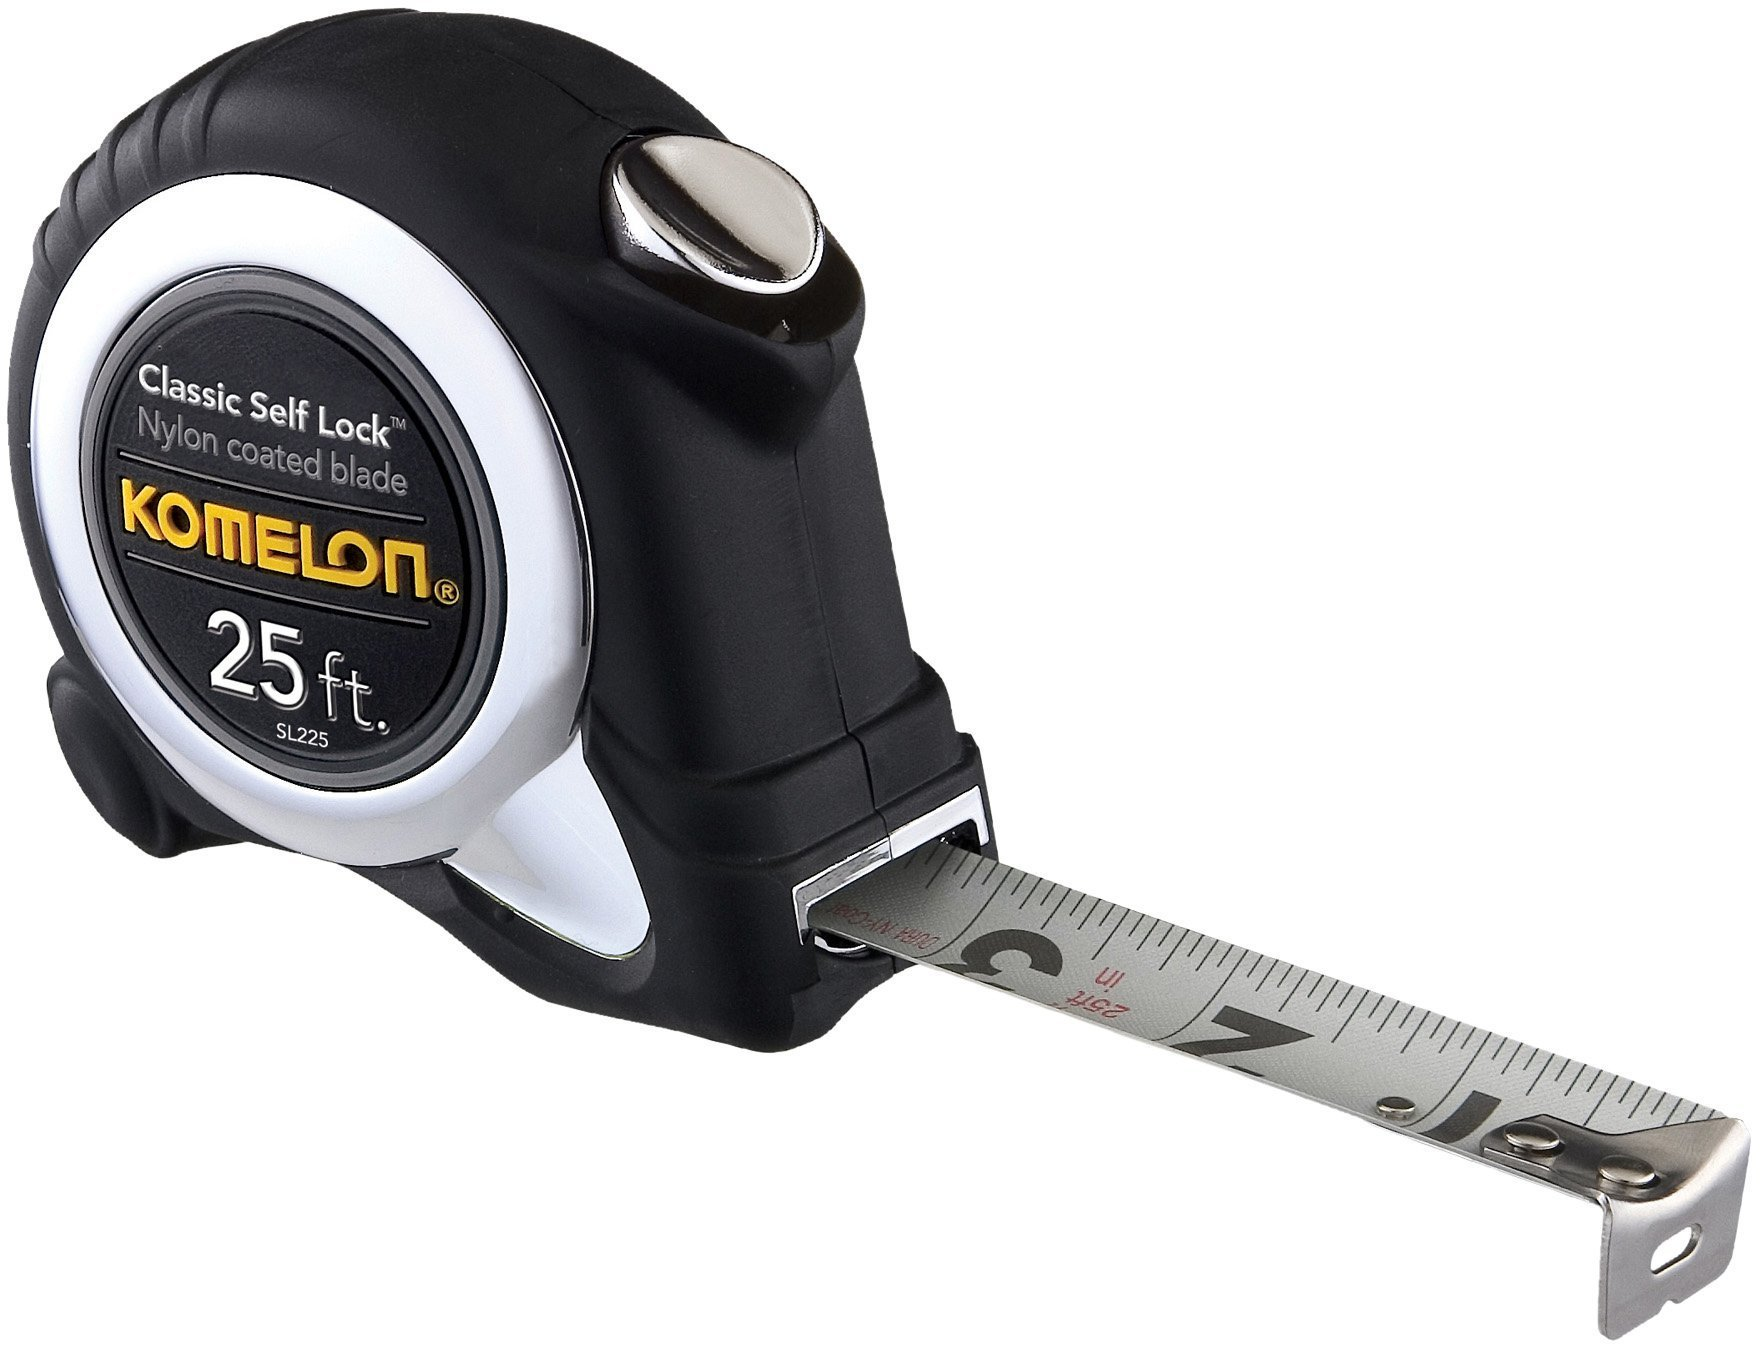 Komelon SL225 Classic Self-Lock 25-Foot Power Measuring Tape